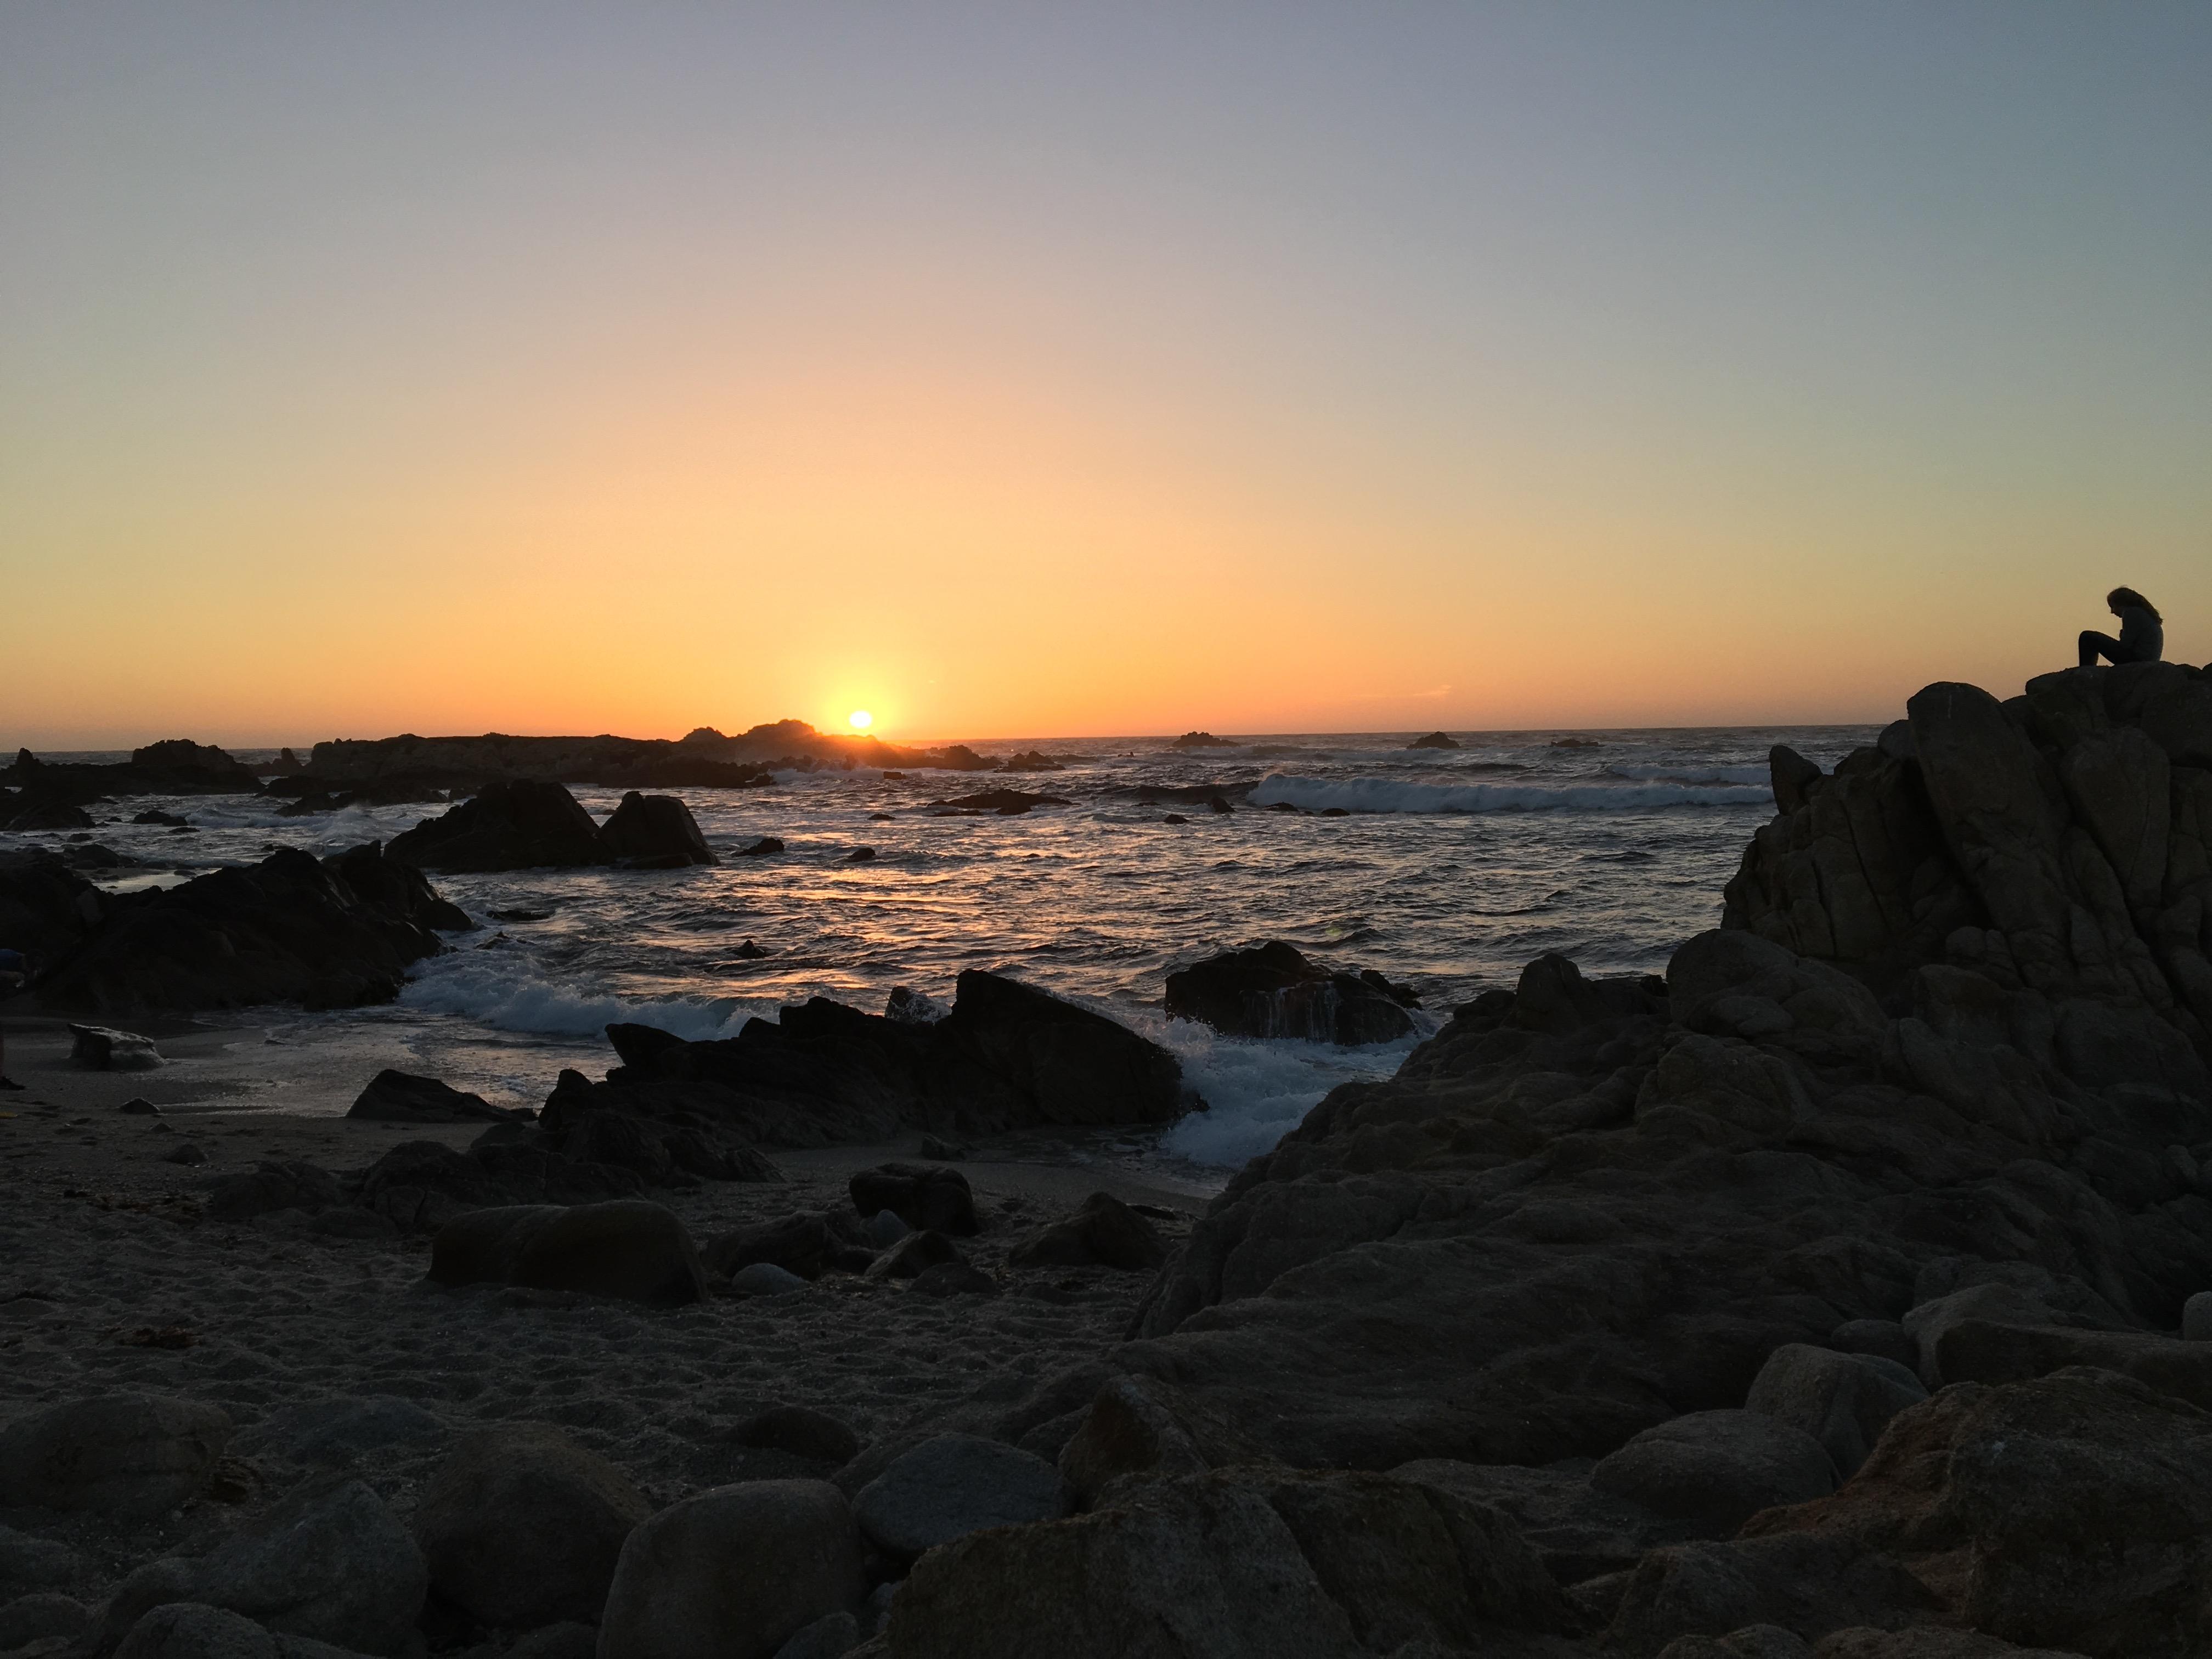 Tramonto sull'oceano pacifico a Mendocino